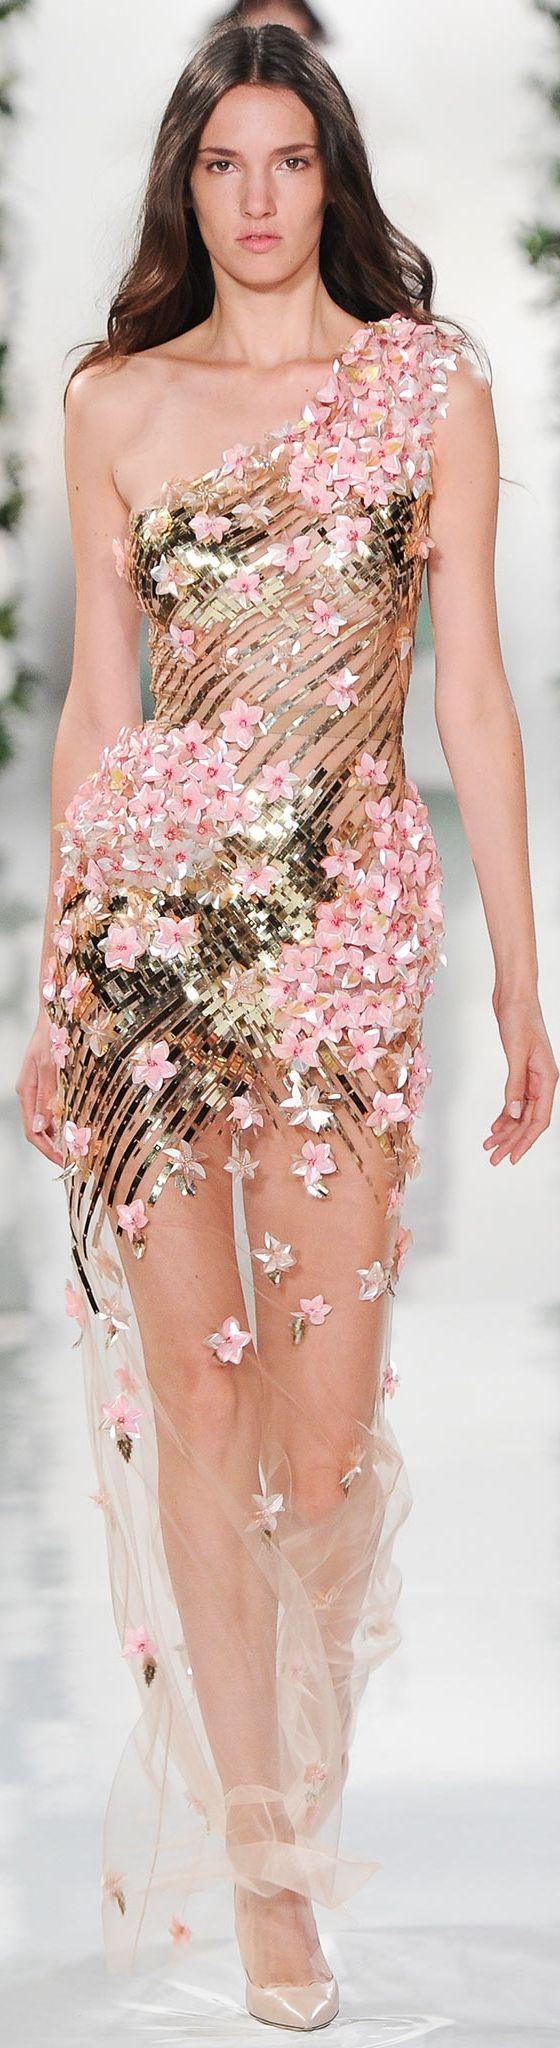 Fleur fashion / karen cox. Valentin Yudashkin ~ Spring Embellished Sheer Mini, 2015: